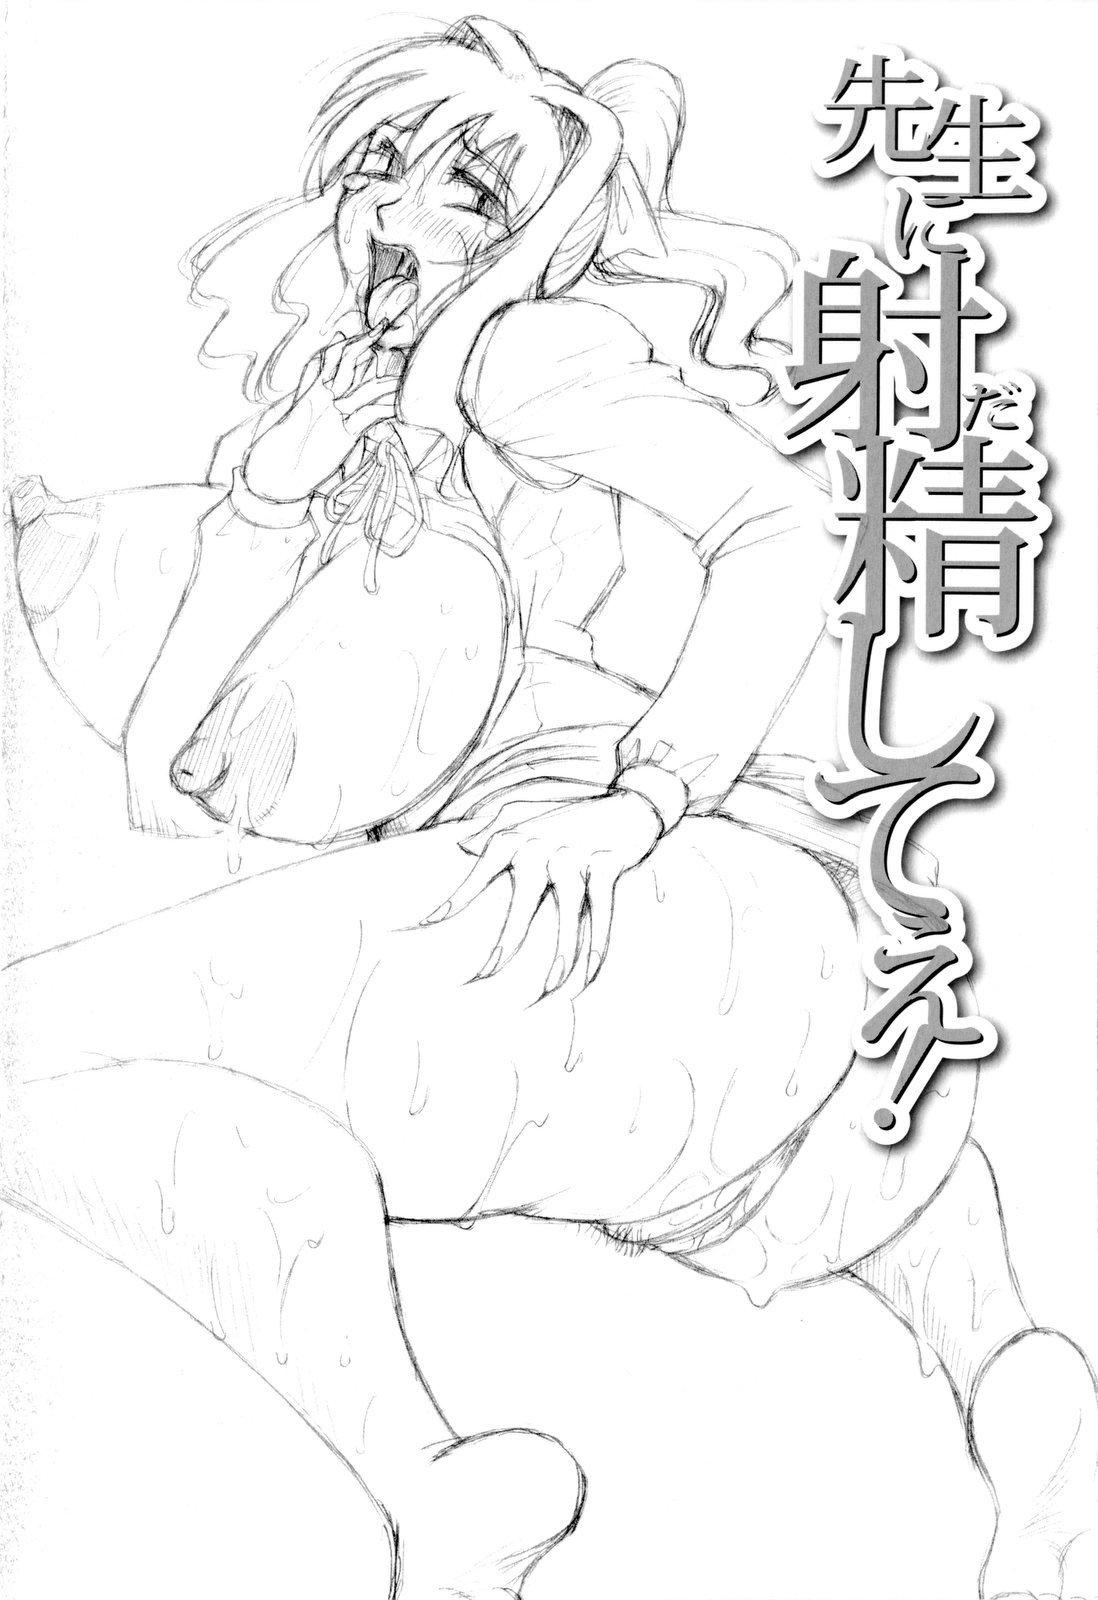 Sensei ni Dashitee! - It ejaculates in the teacher! 214